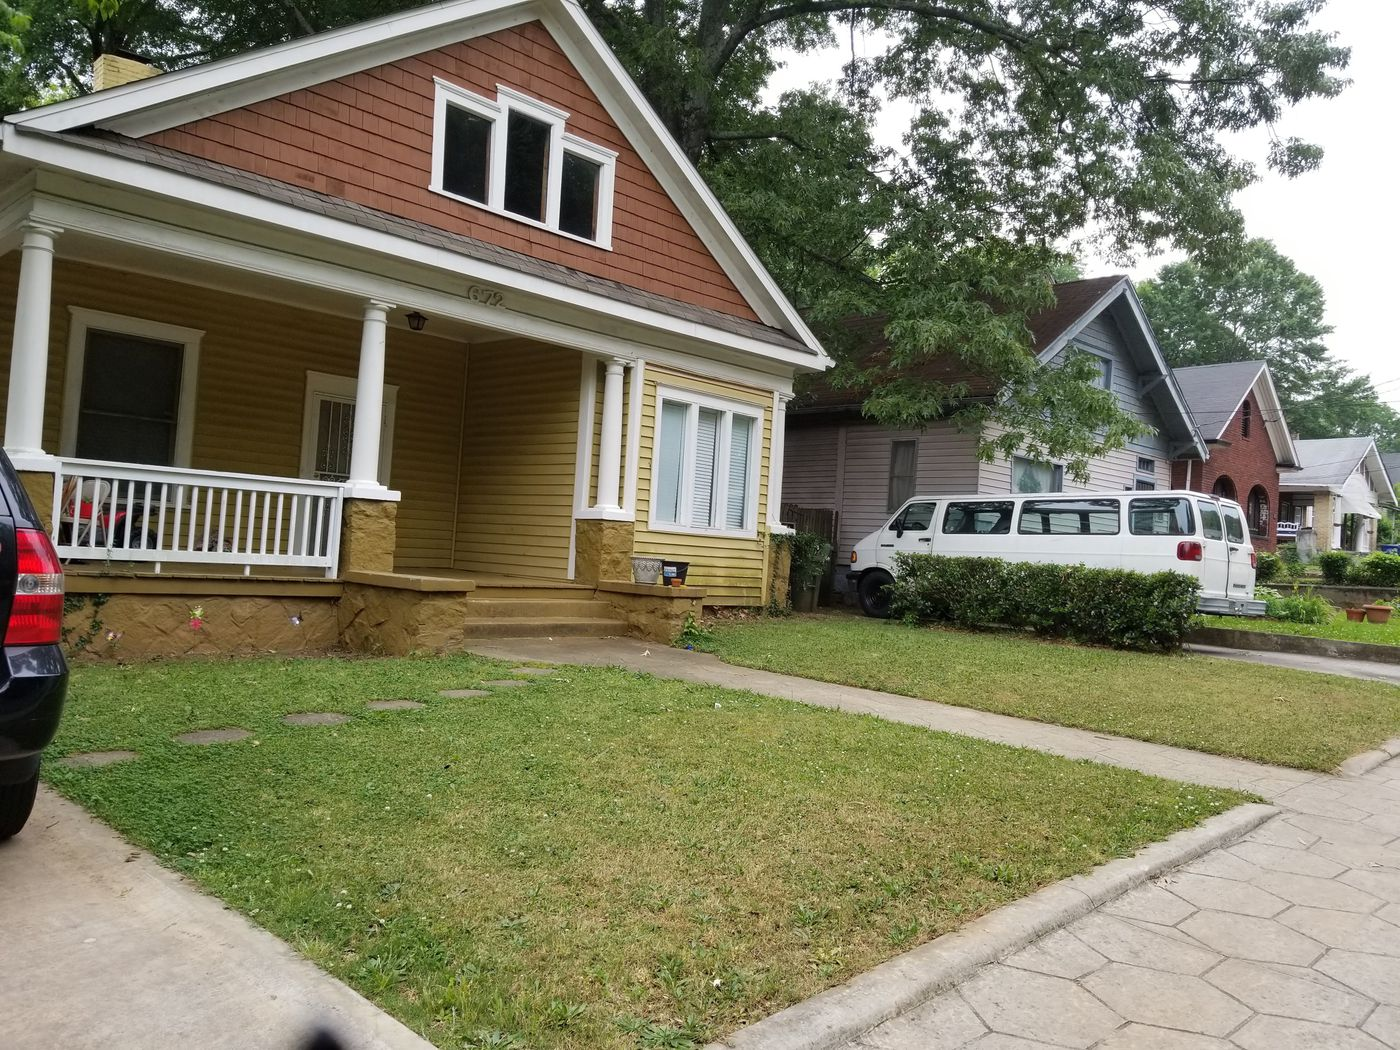 My Atlanta series: Janaya Keaton was just evicted, and she